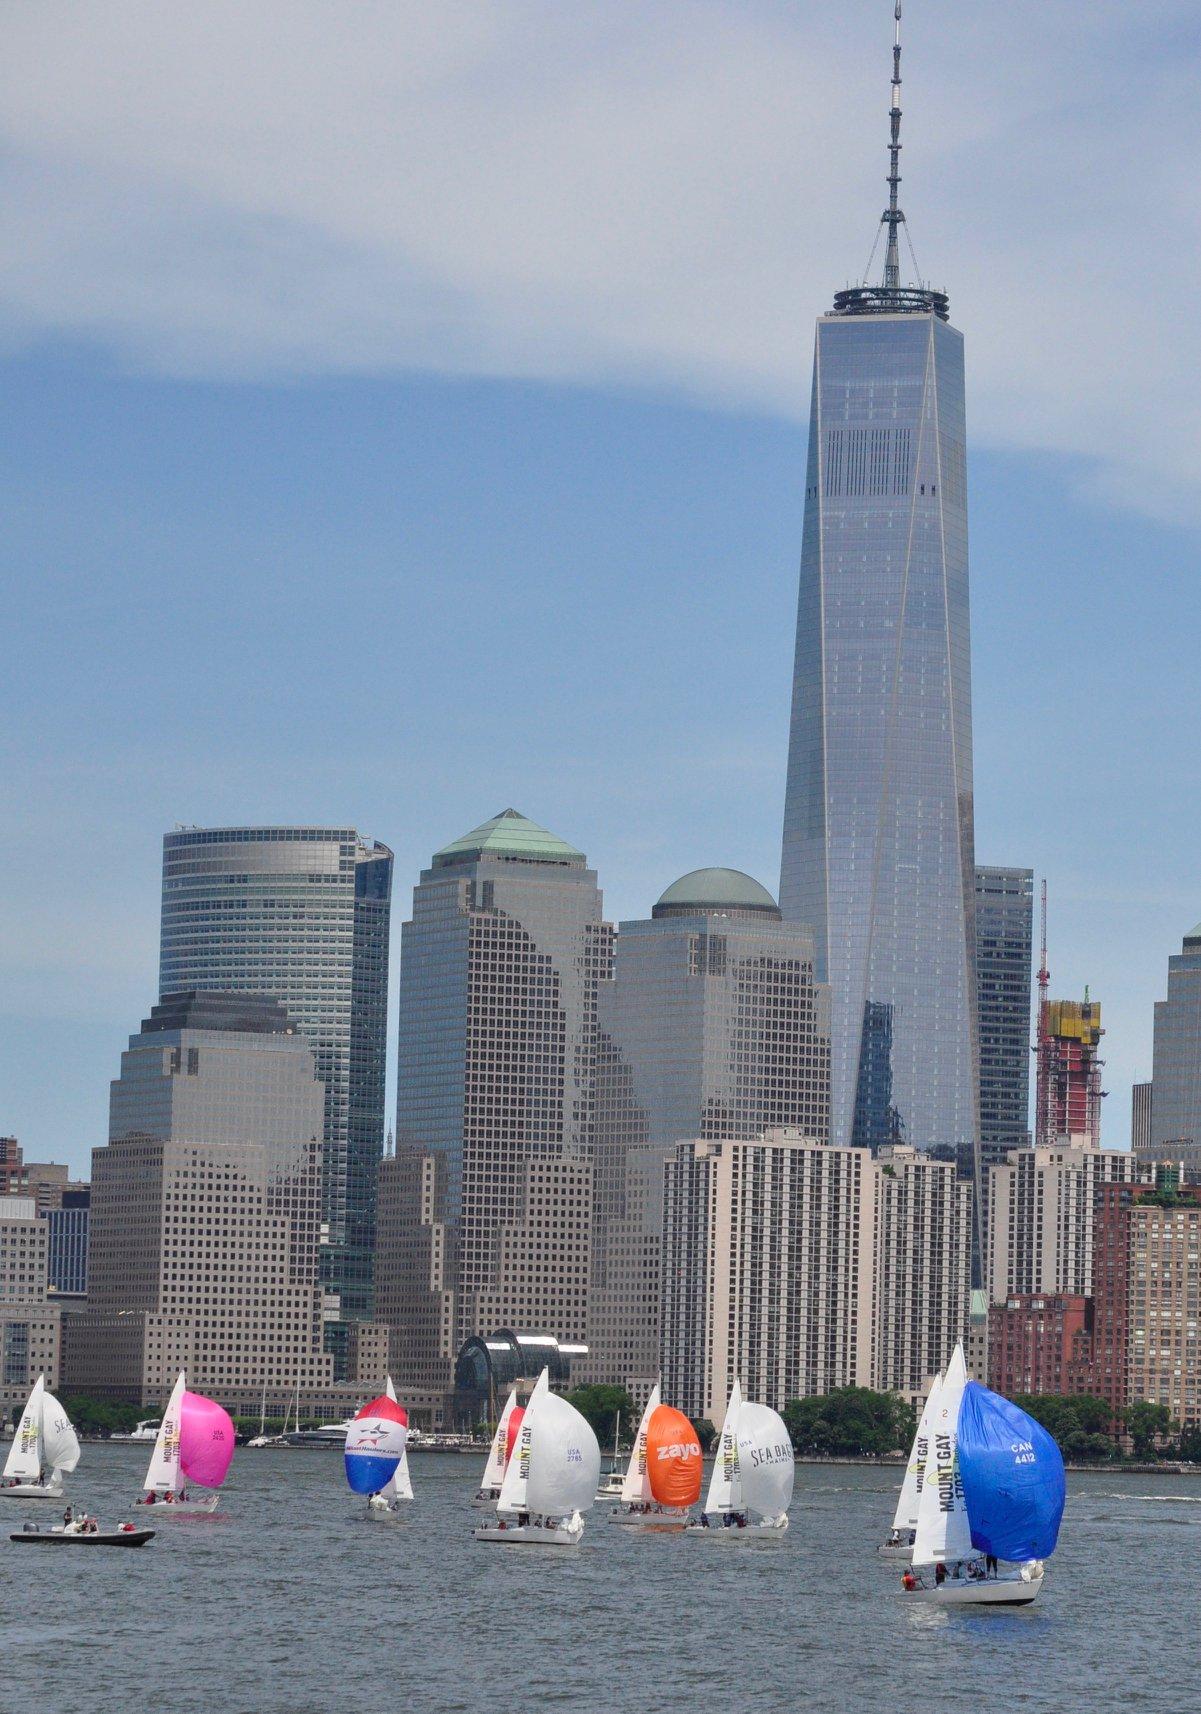 J_24s racing near the Manhattan skyline during the Lady Liberty Regatta.jpg